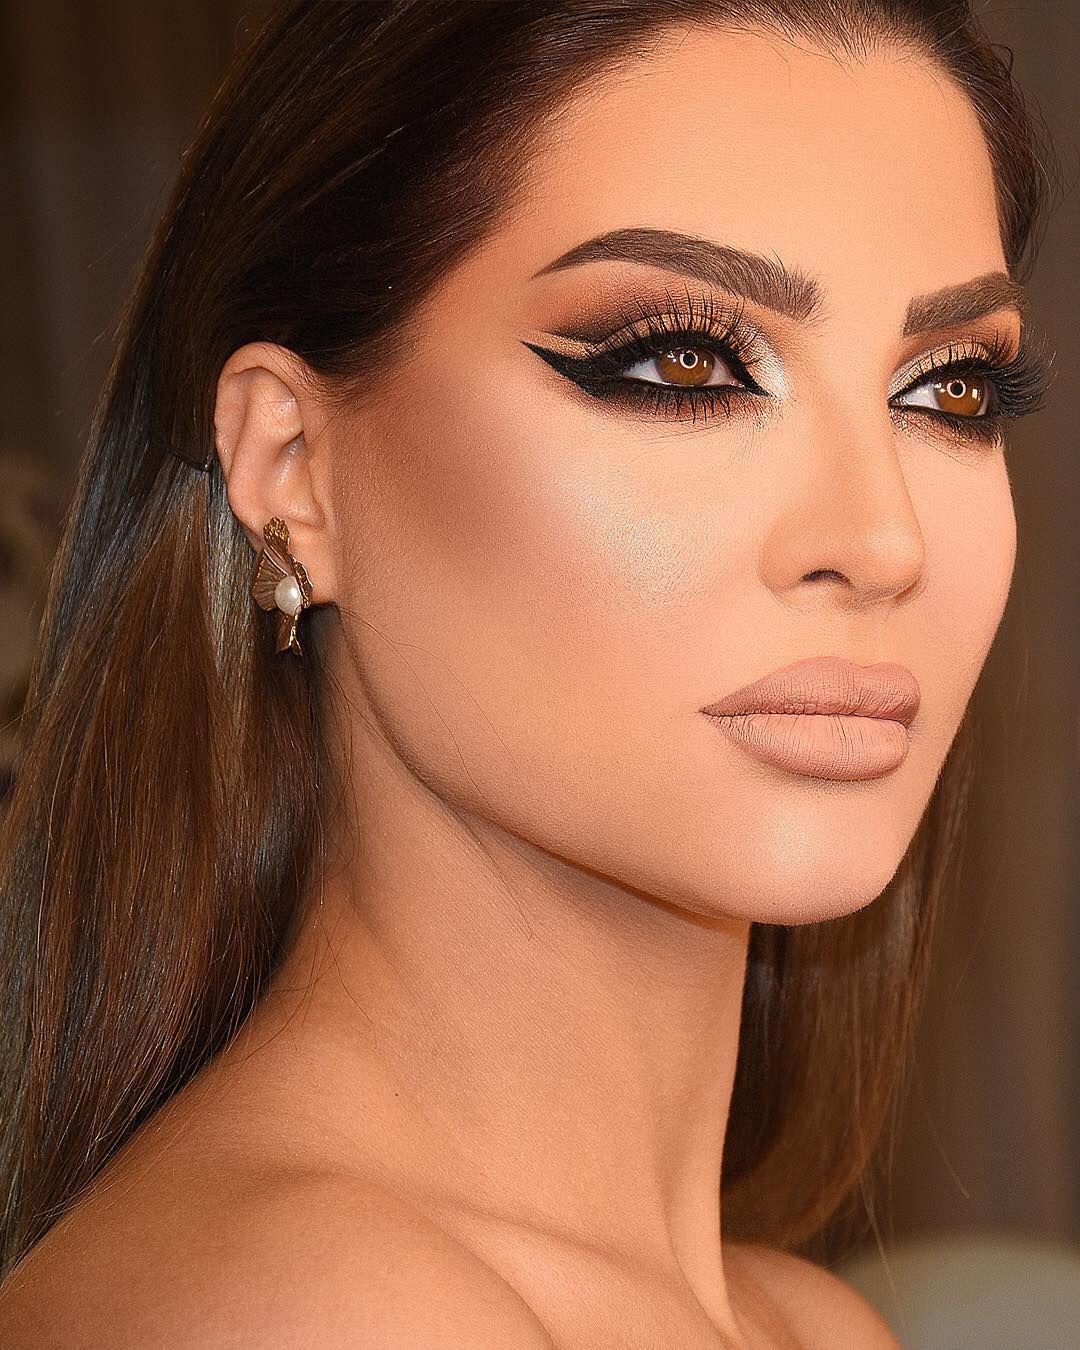 "Talal Morcos / طلال مرقص on Instagram: ""Just a golden cut crease"